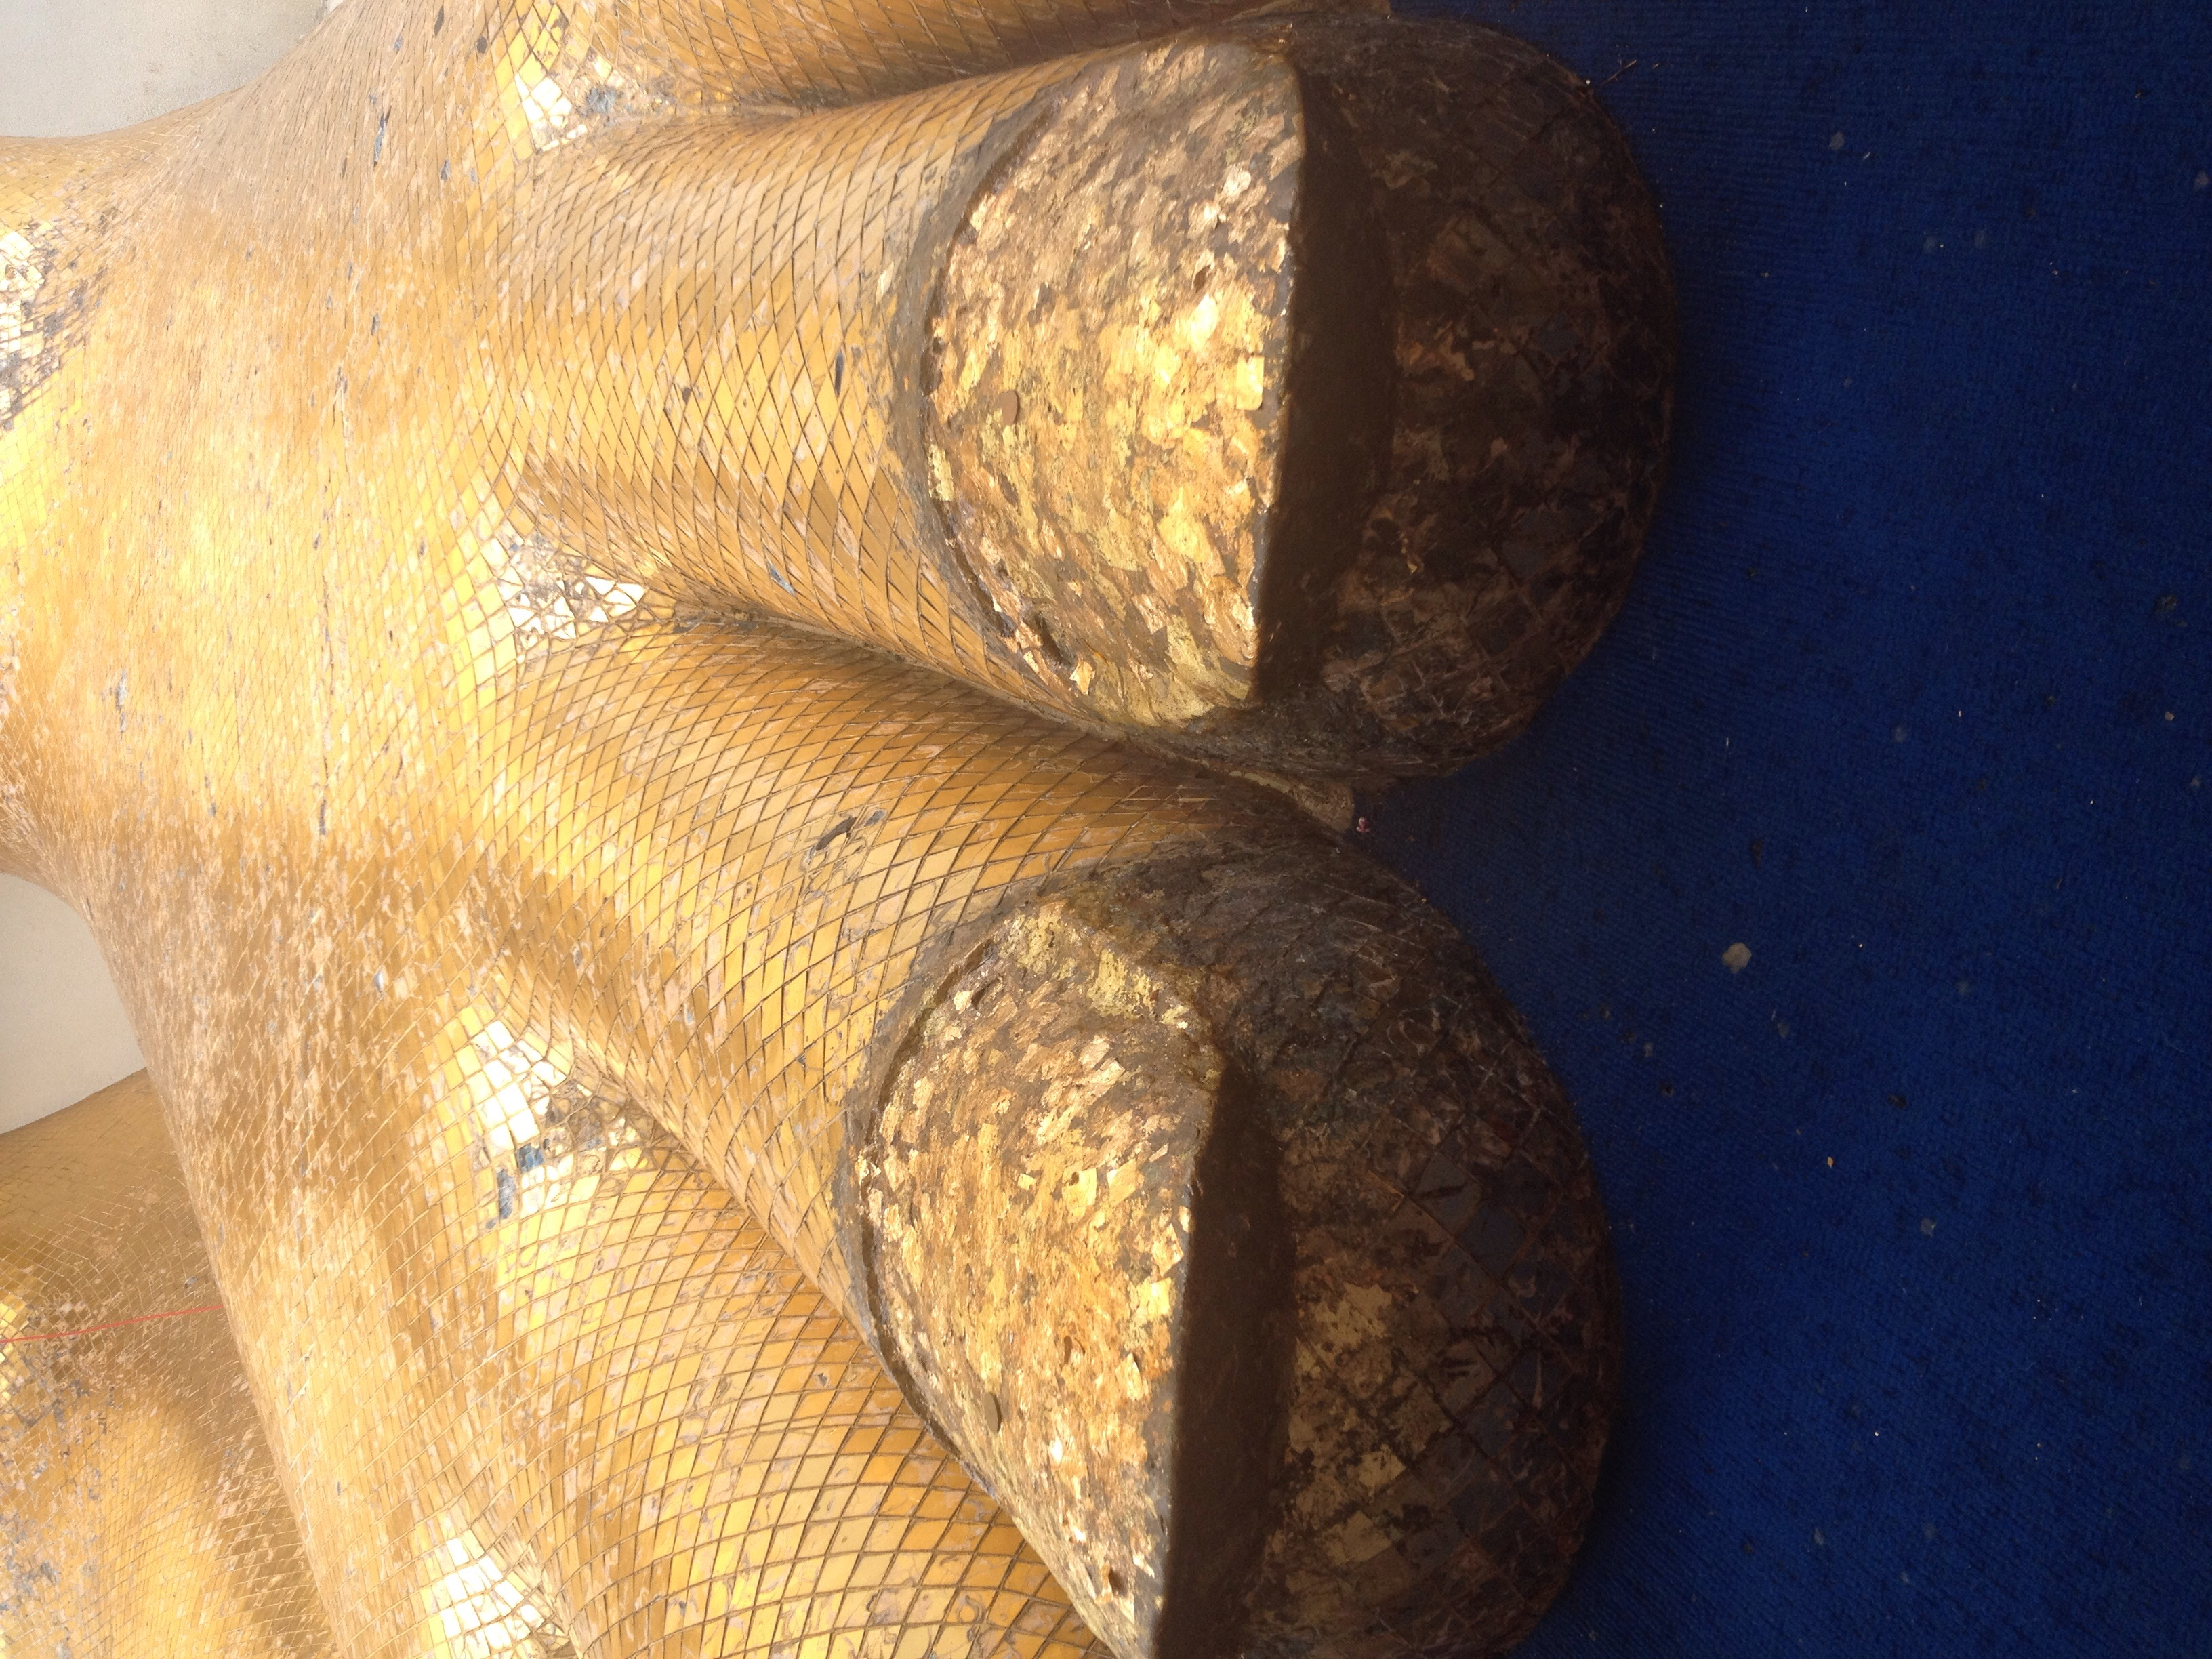 Giant gold toenails